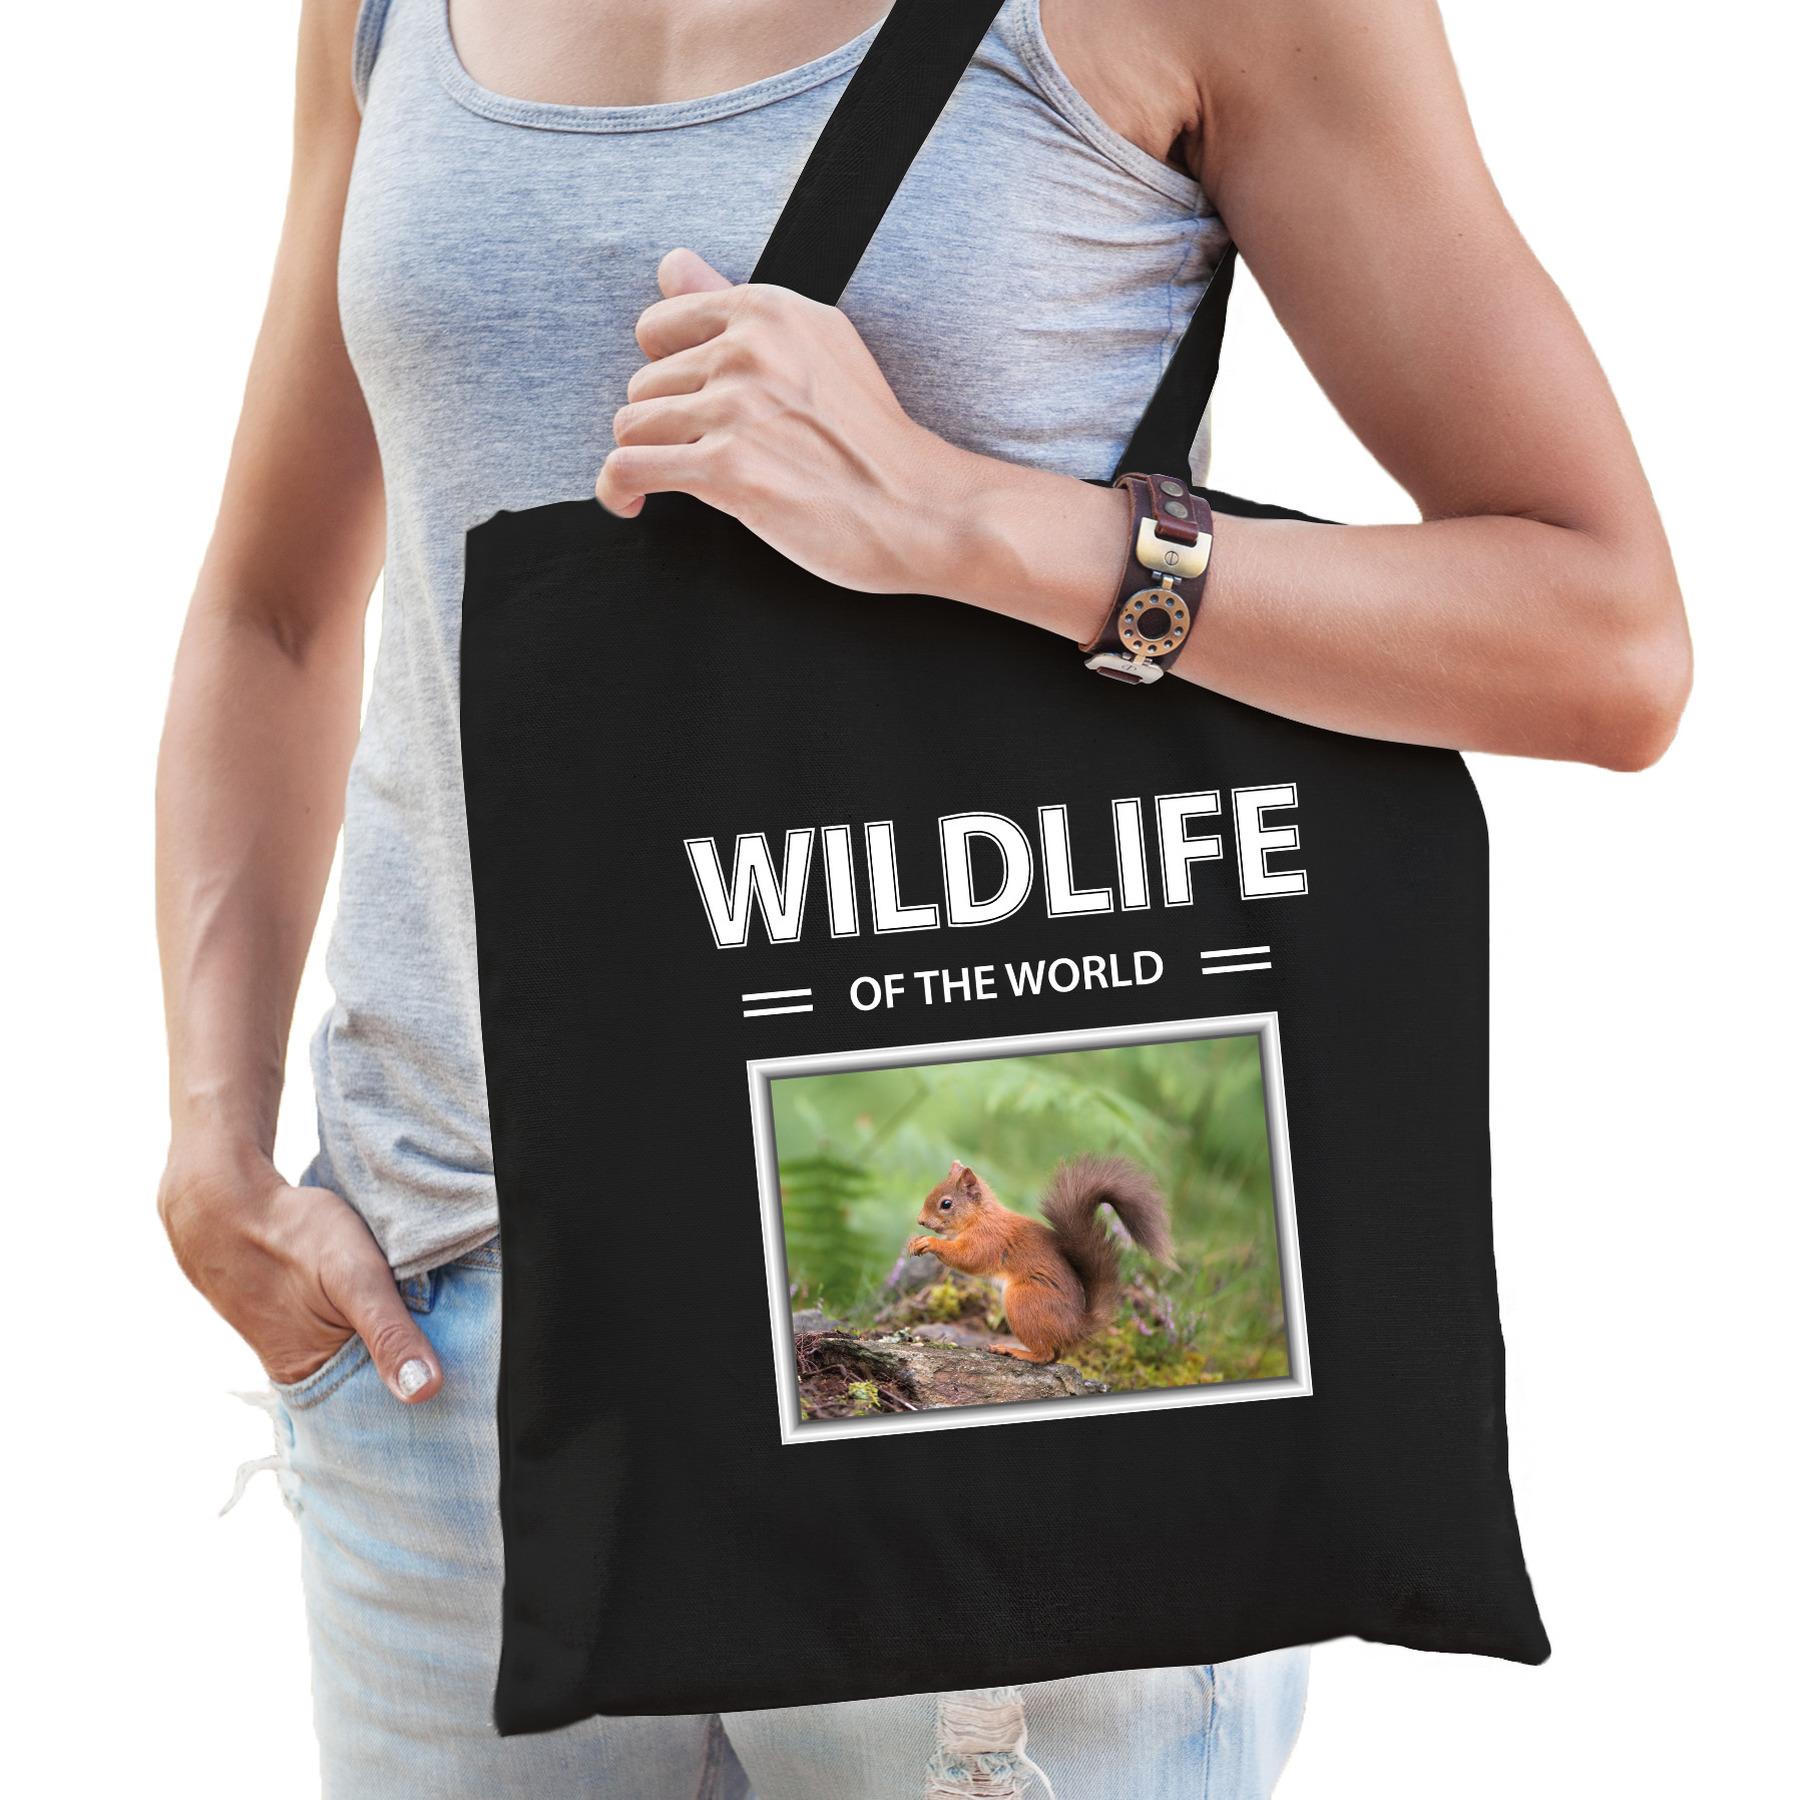 Katoenen tasje Eekhoorns zwart - wildlife of the world Eekhoorn cadeau tas